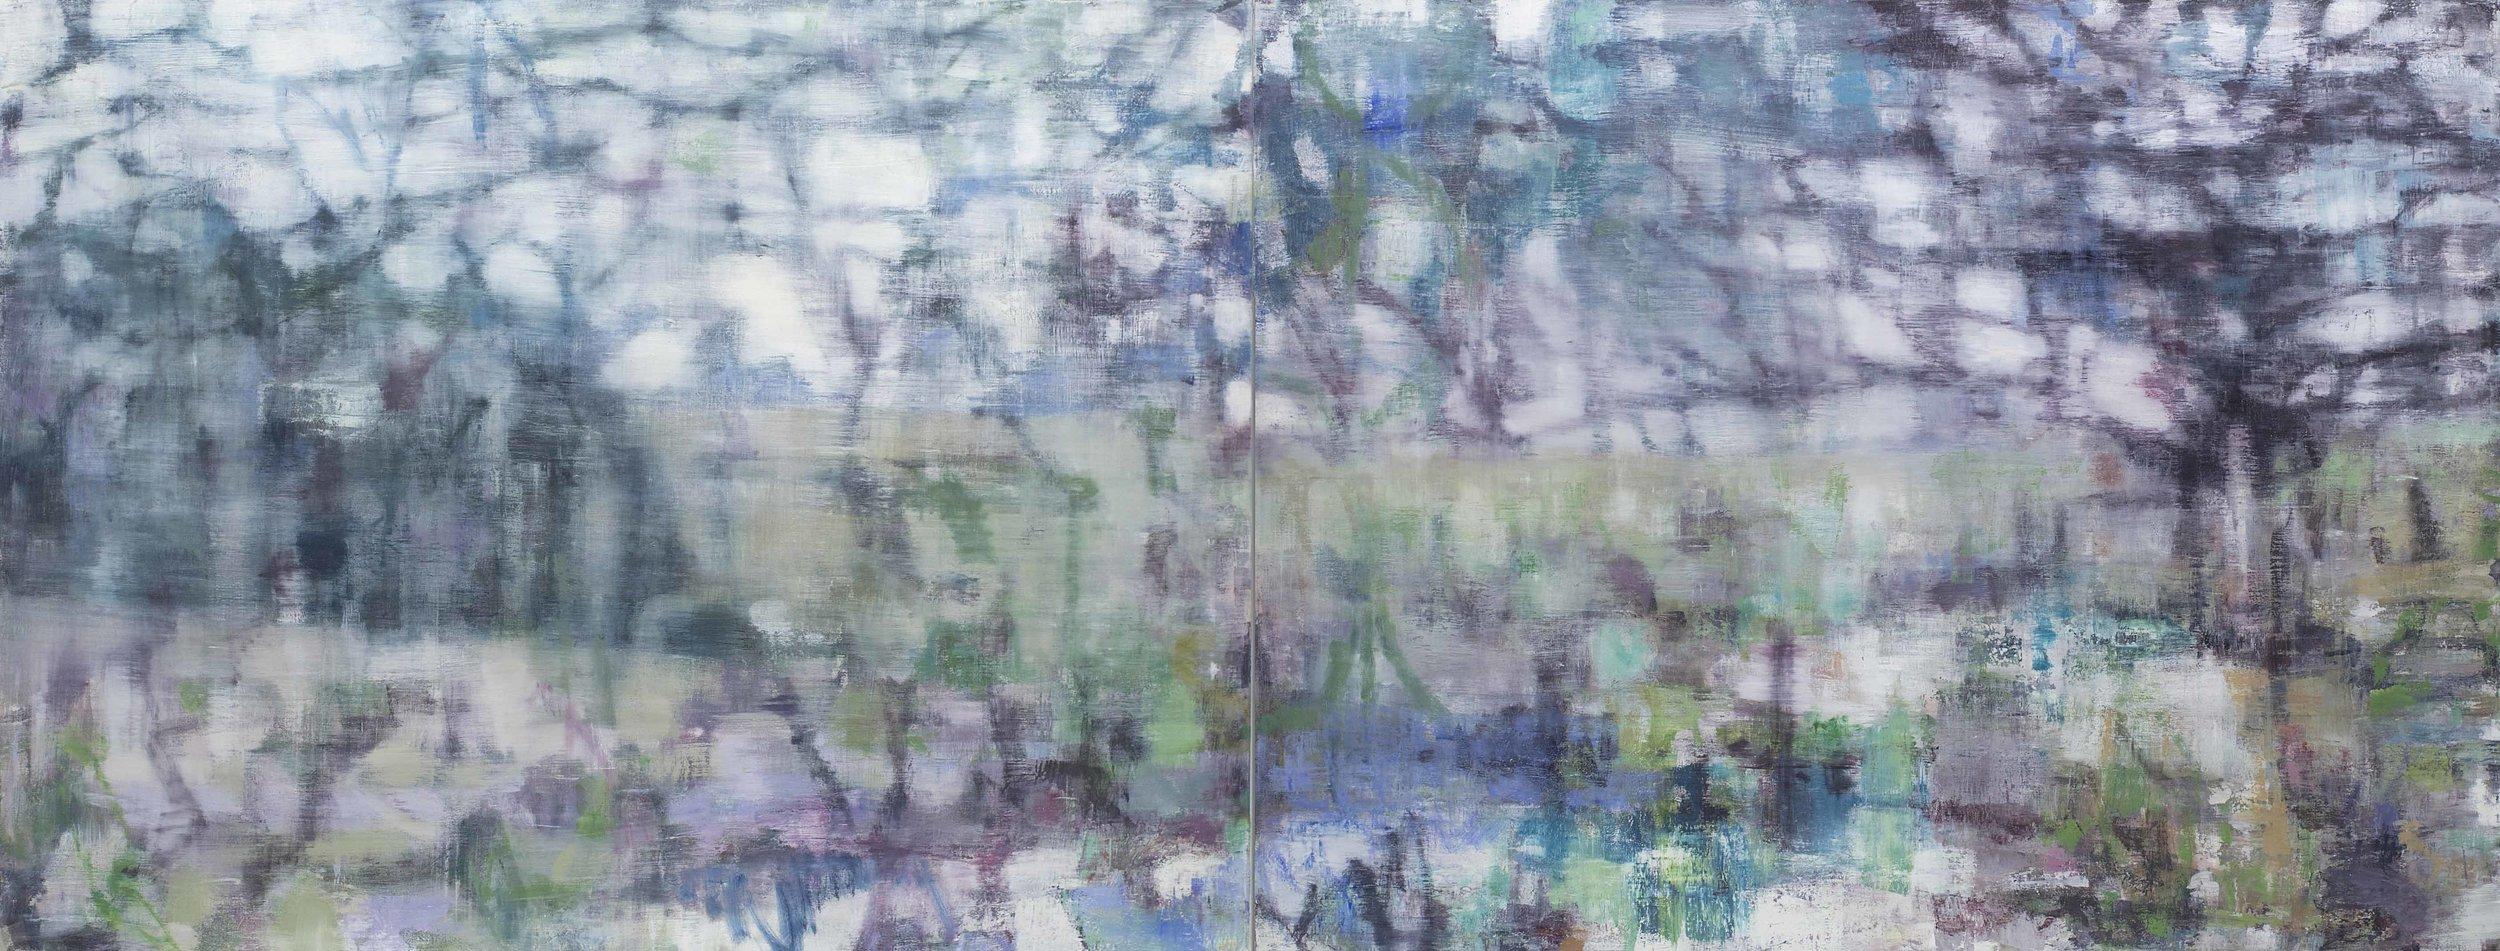 Joanna Logue, Heartland II , 2016, oil on linen, 130 x 340cm